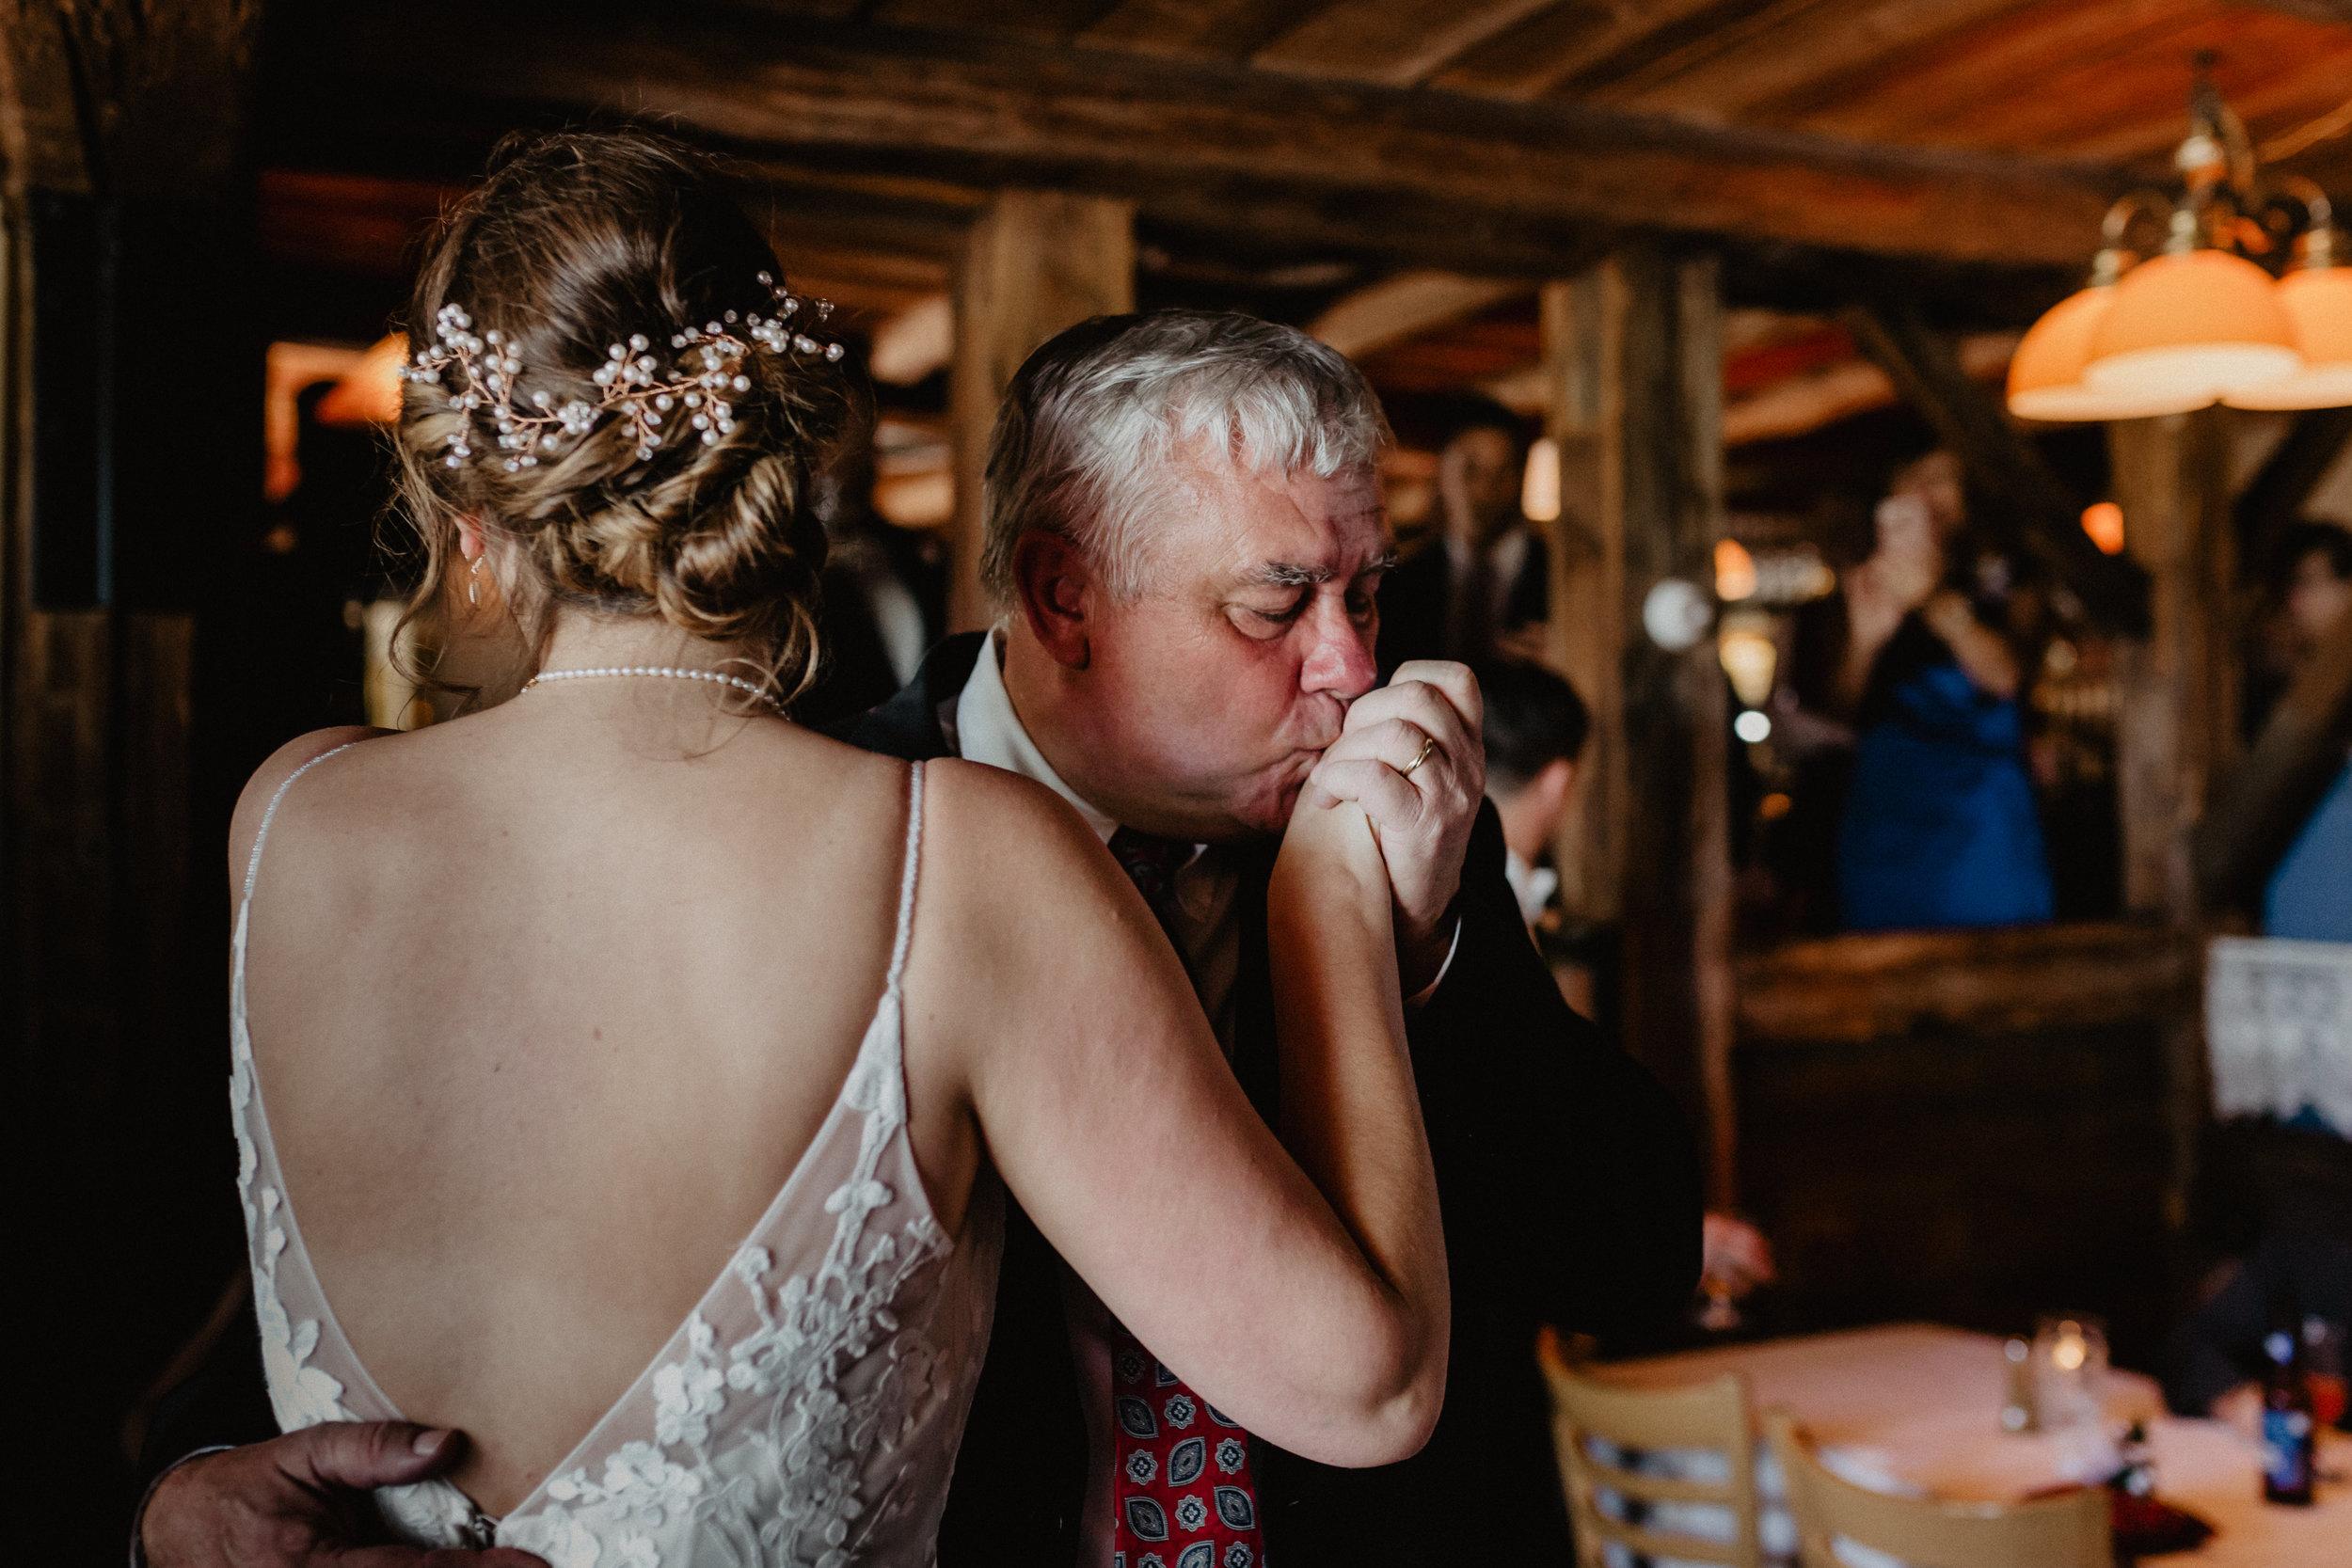 upstate_ny_wedding-46.jpg